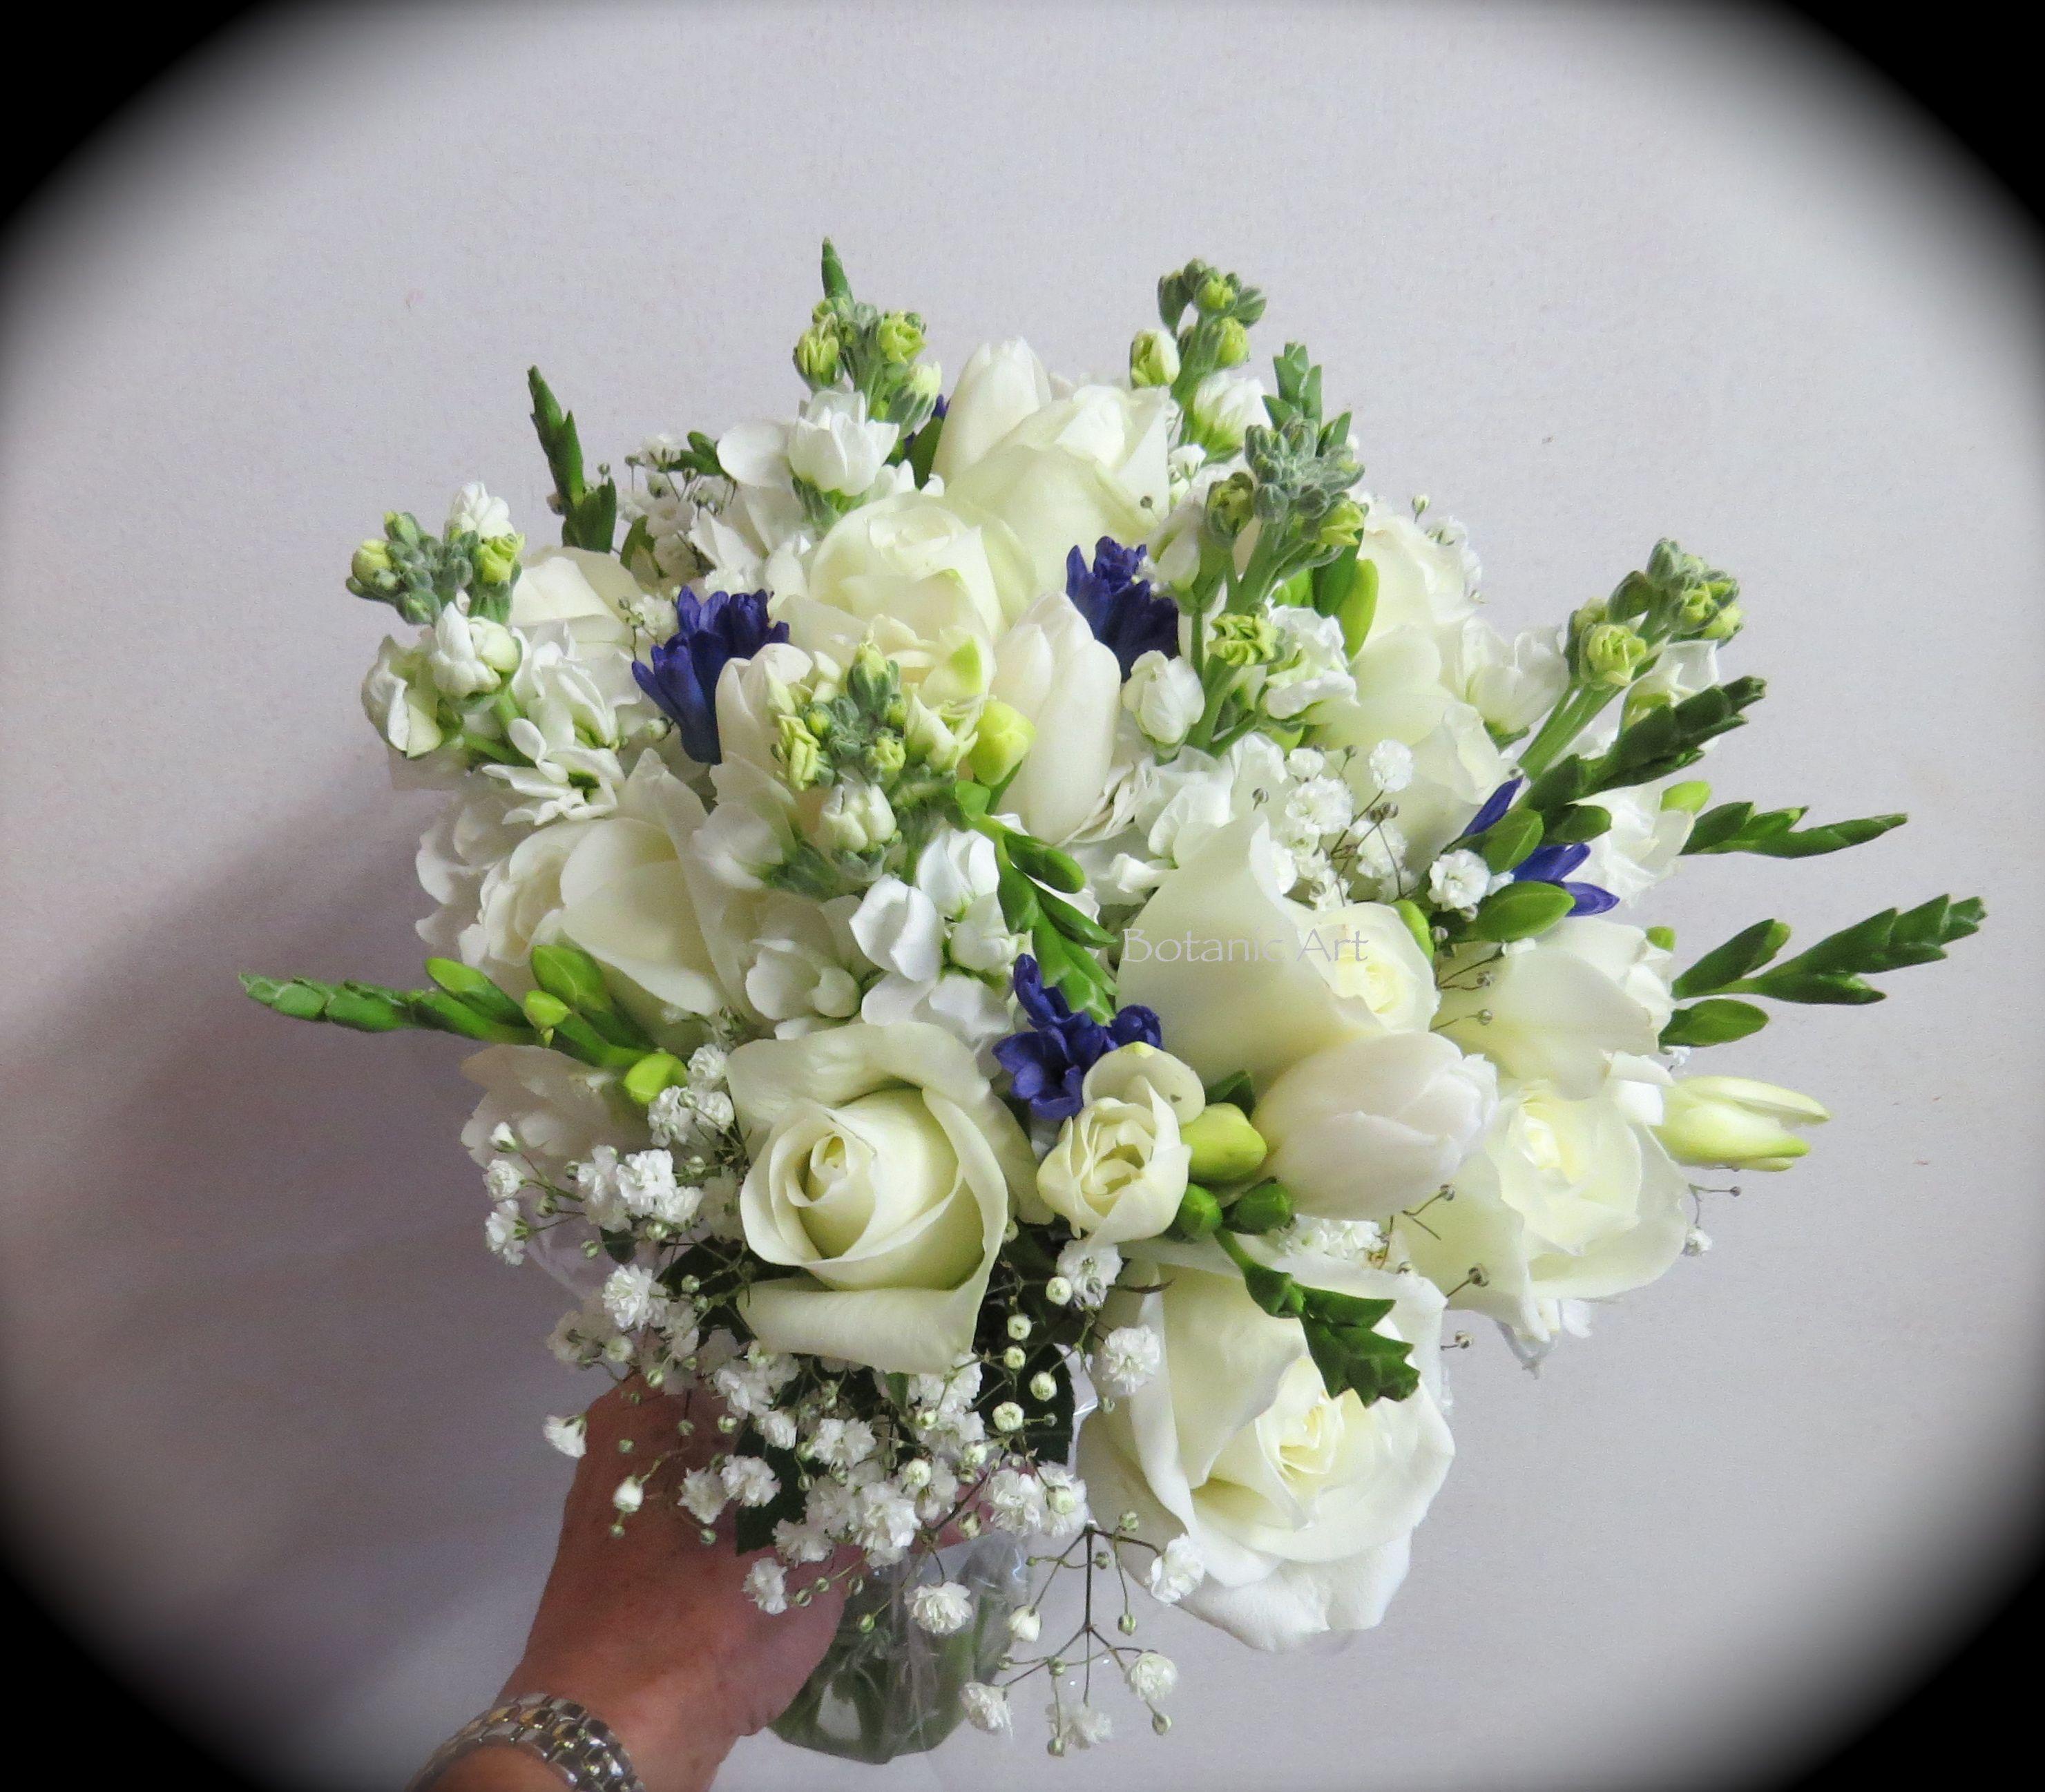 26 Rustic Wedding Ideas That Still Feel Elevated: Winter White Wedding Bouquet, Brides Bouquet, Tulips